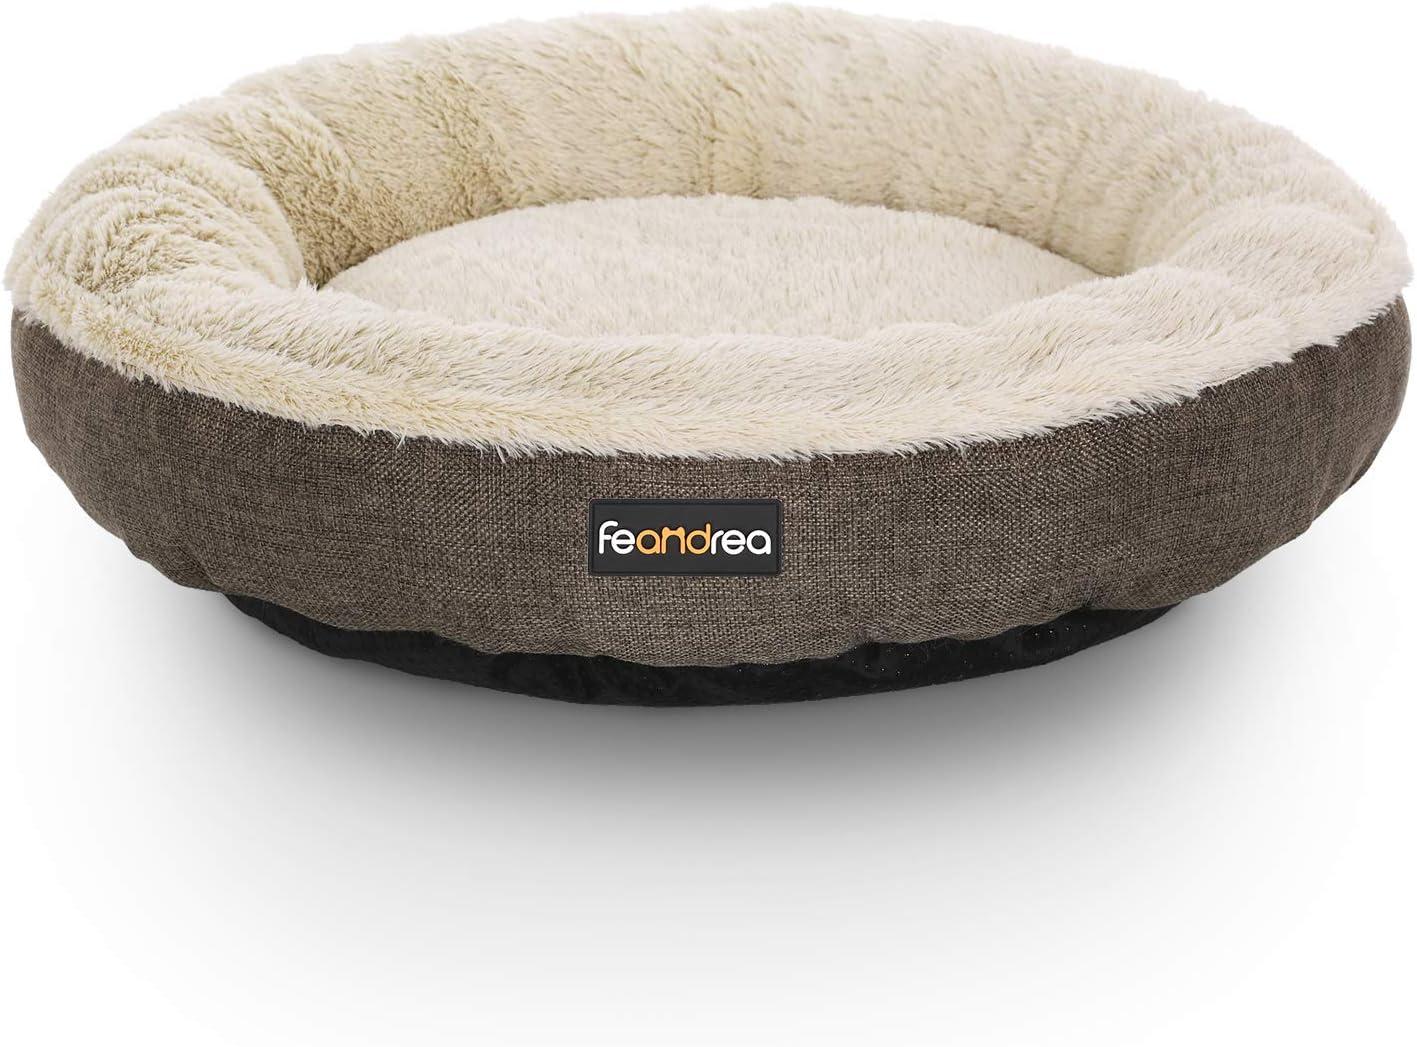 FEANDREA Sofá para Perro, Cama para Mascota, Redonda, 55 cm, Marrón PGW55C